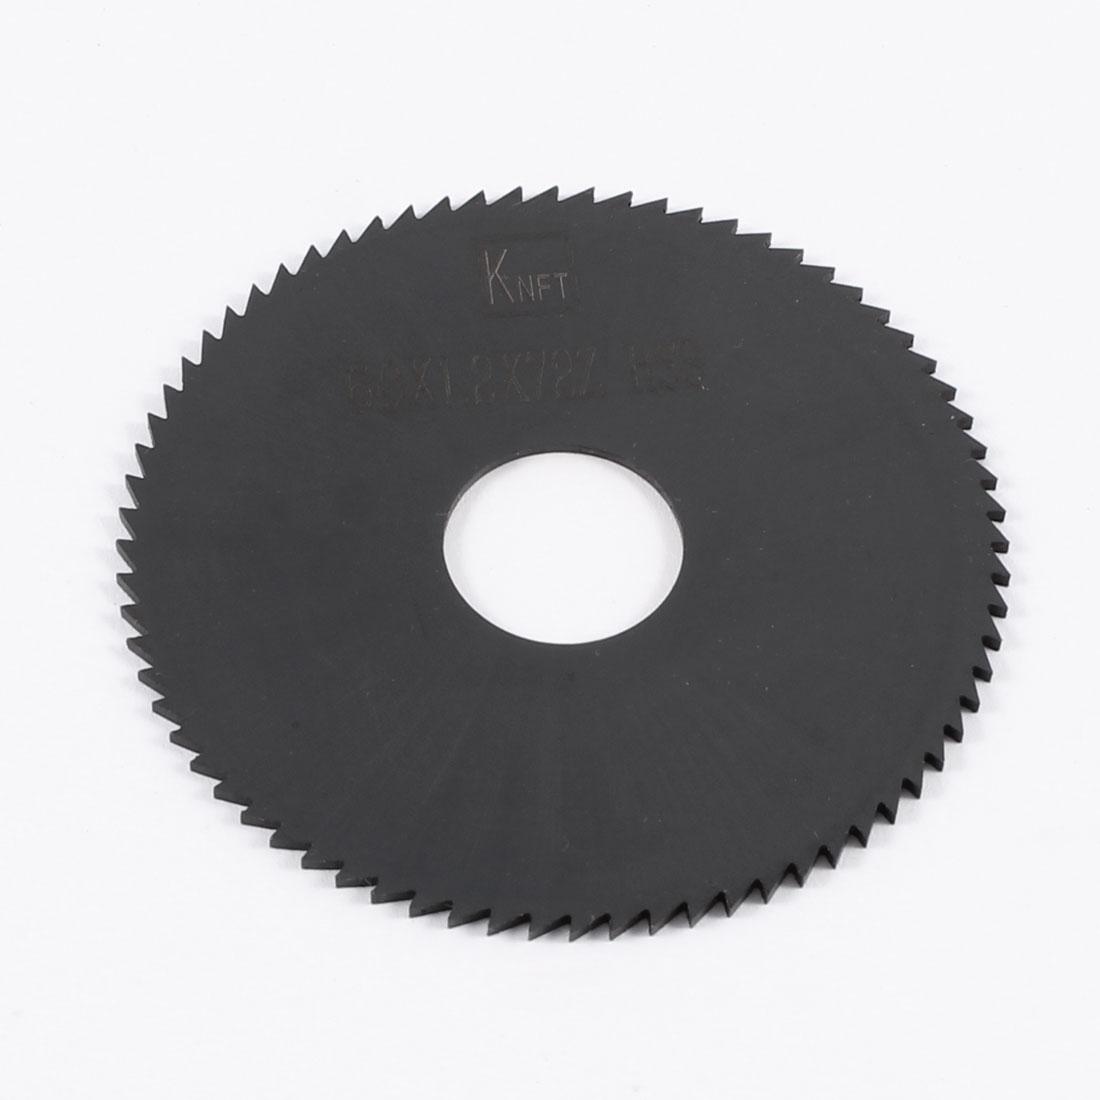 60mm x 1.2mm x 16mm Milling Cutter HSS 72T Slitting Saw Blade Black